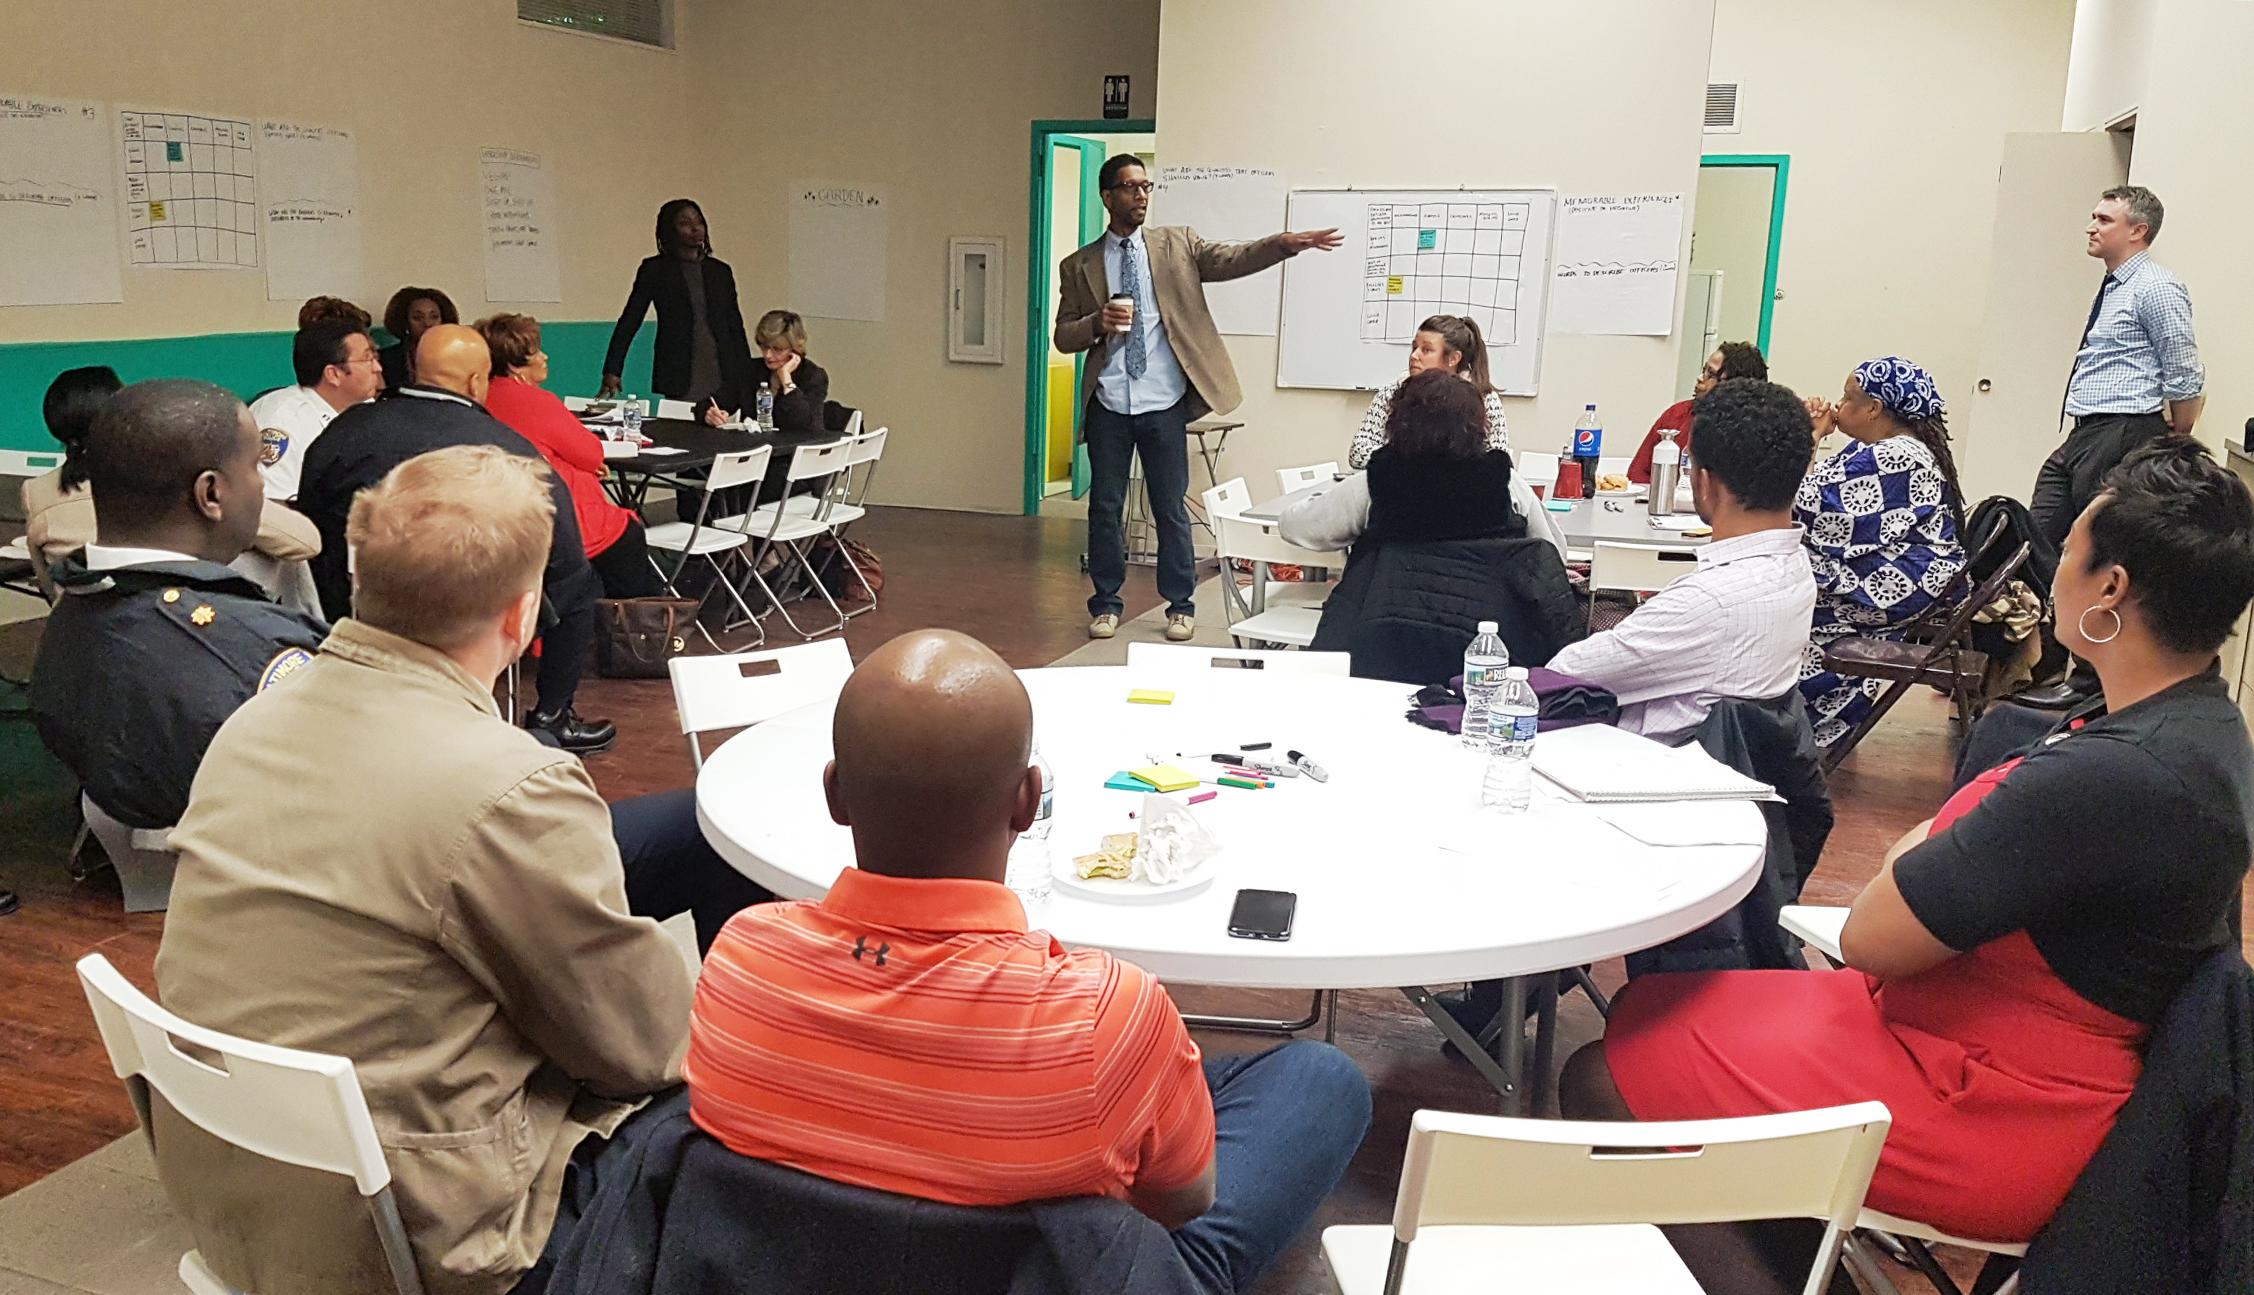 Ray Kelly doing workshop introductions at No Boundaries Coalition